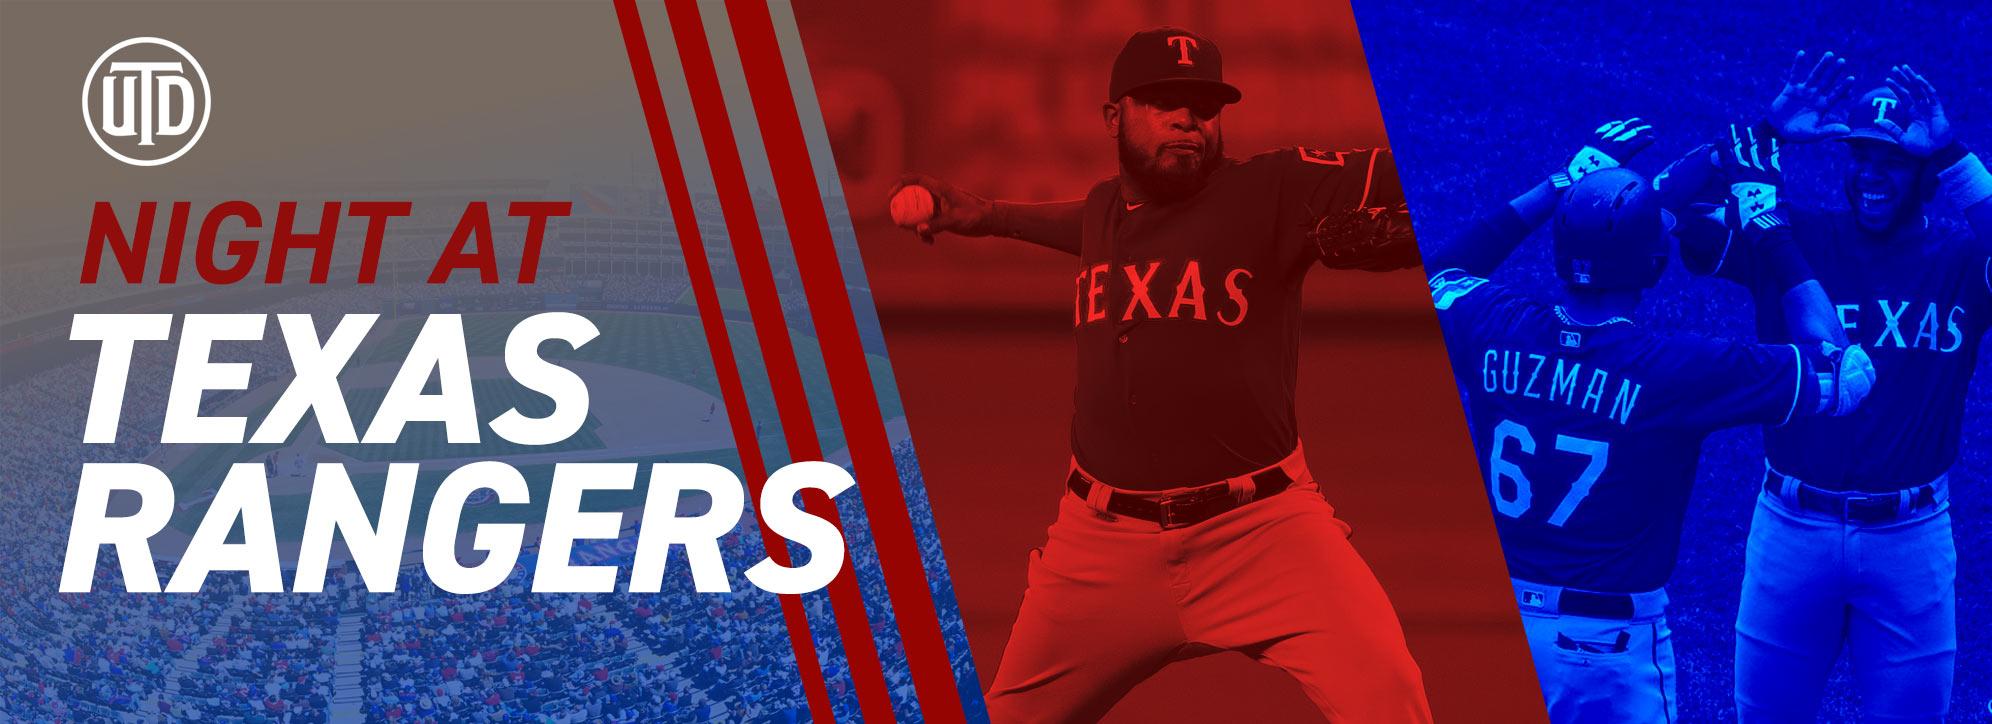 Night at Texas Rangers